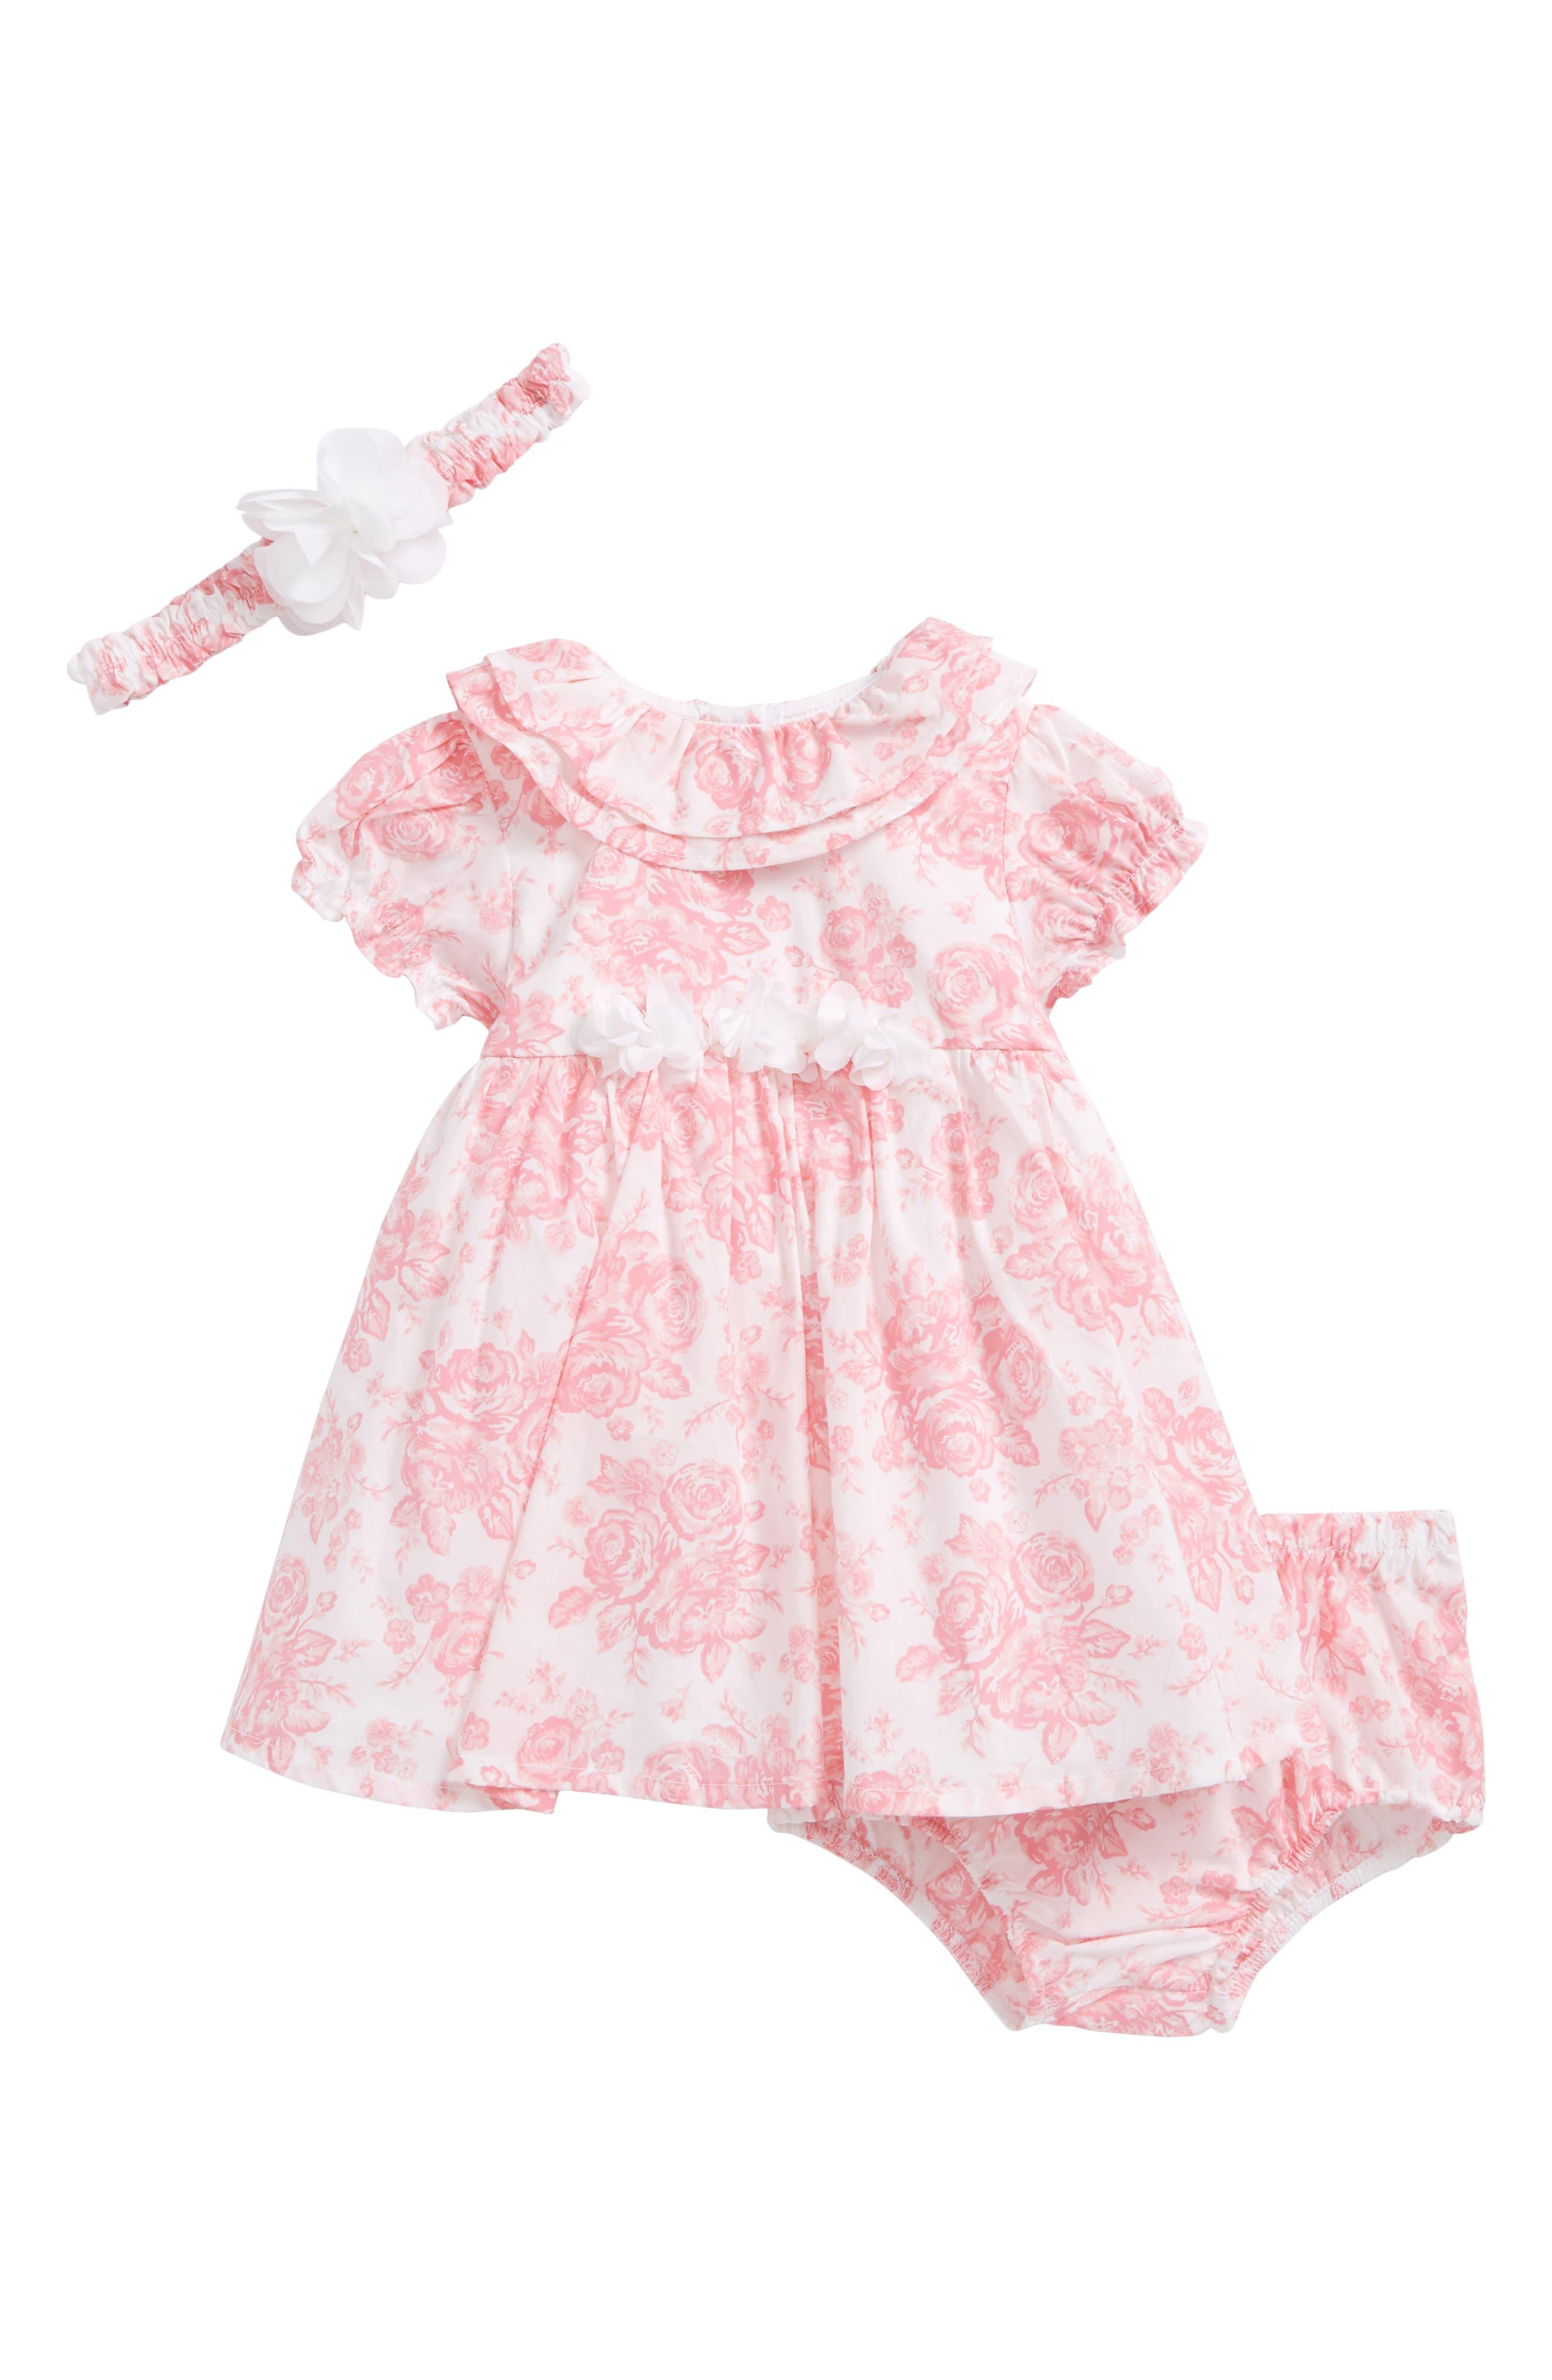 Rose Bouquet Dress & Headband Set,                         Main,                         color,